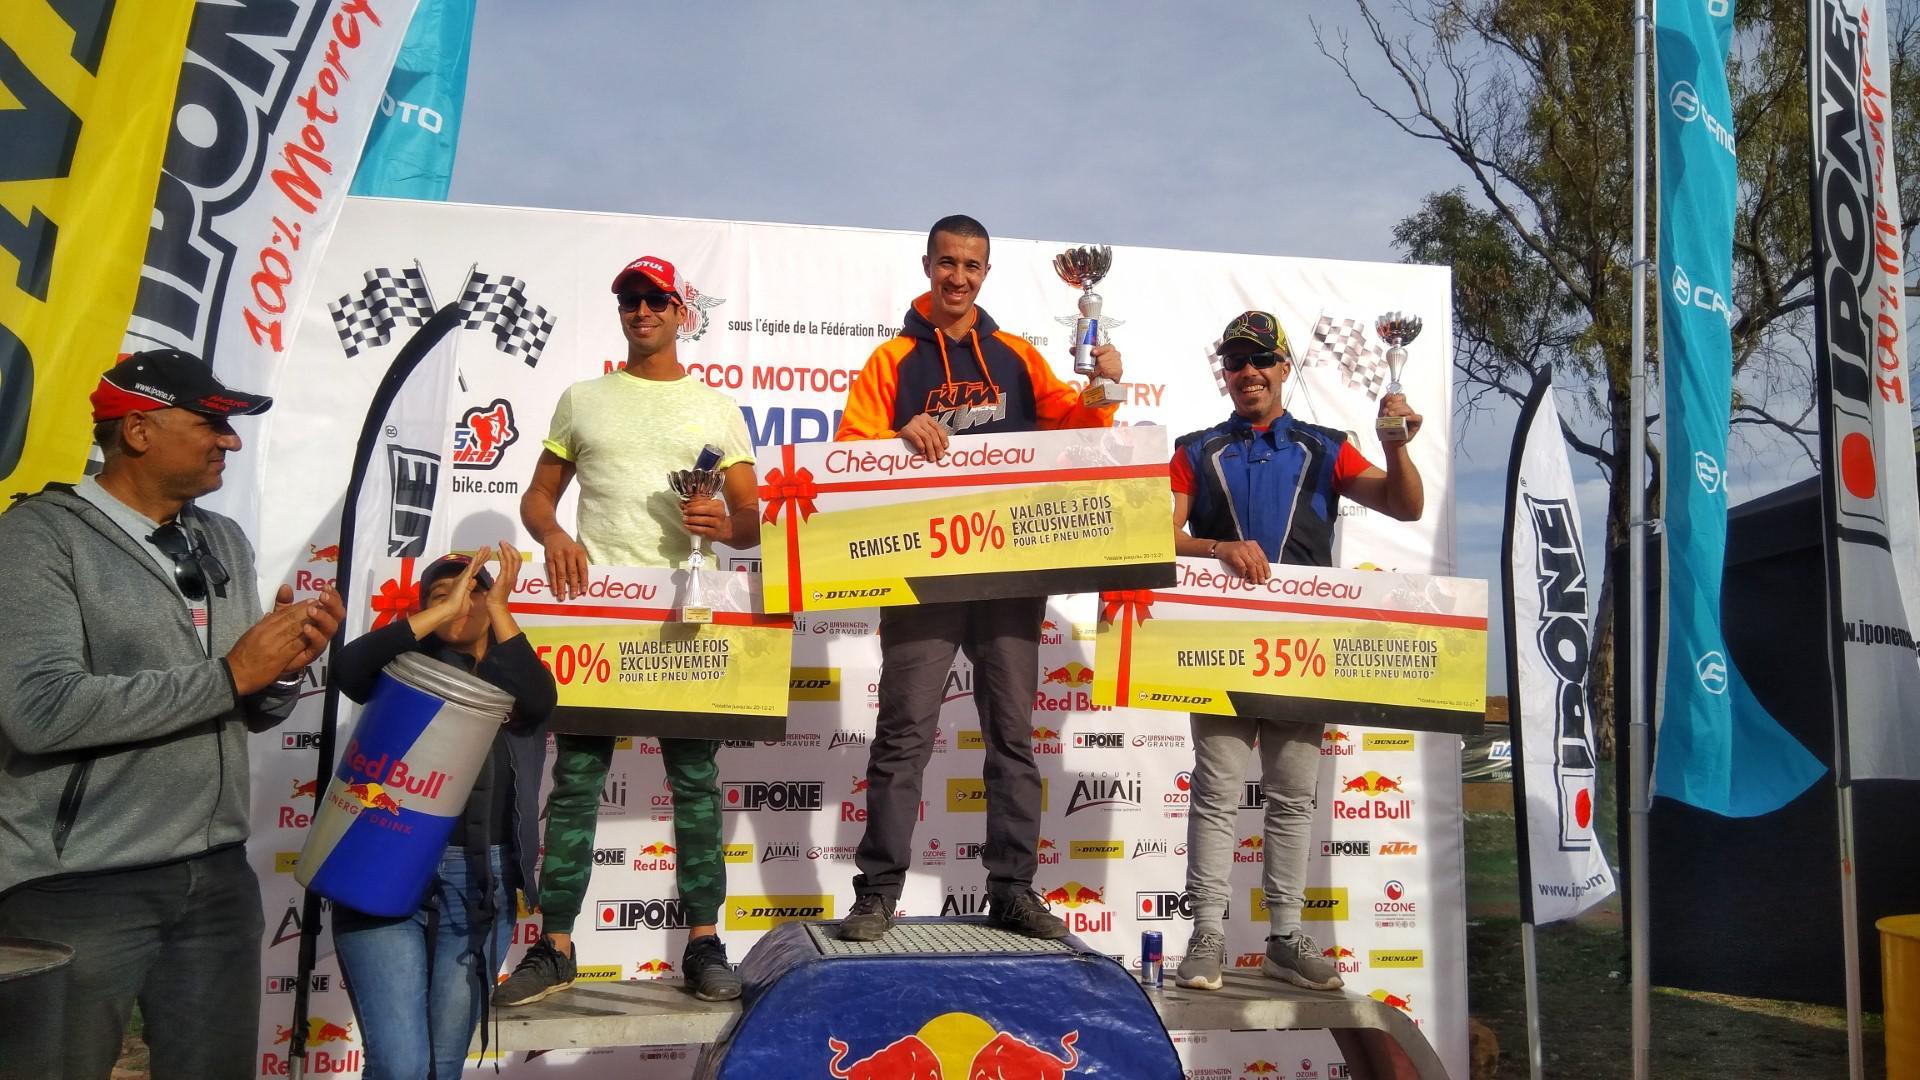 finale-du-championnat-du-maroc-de-motocross-et-cross-country-1164-1.jpg